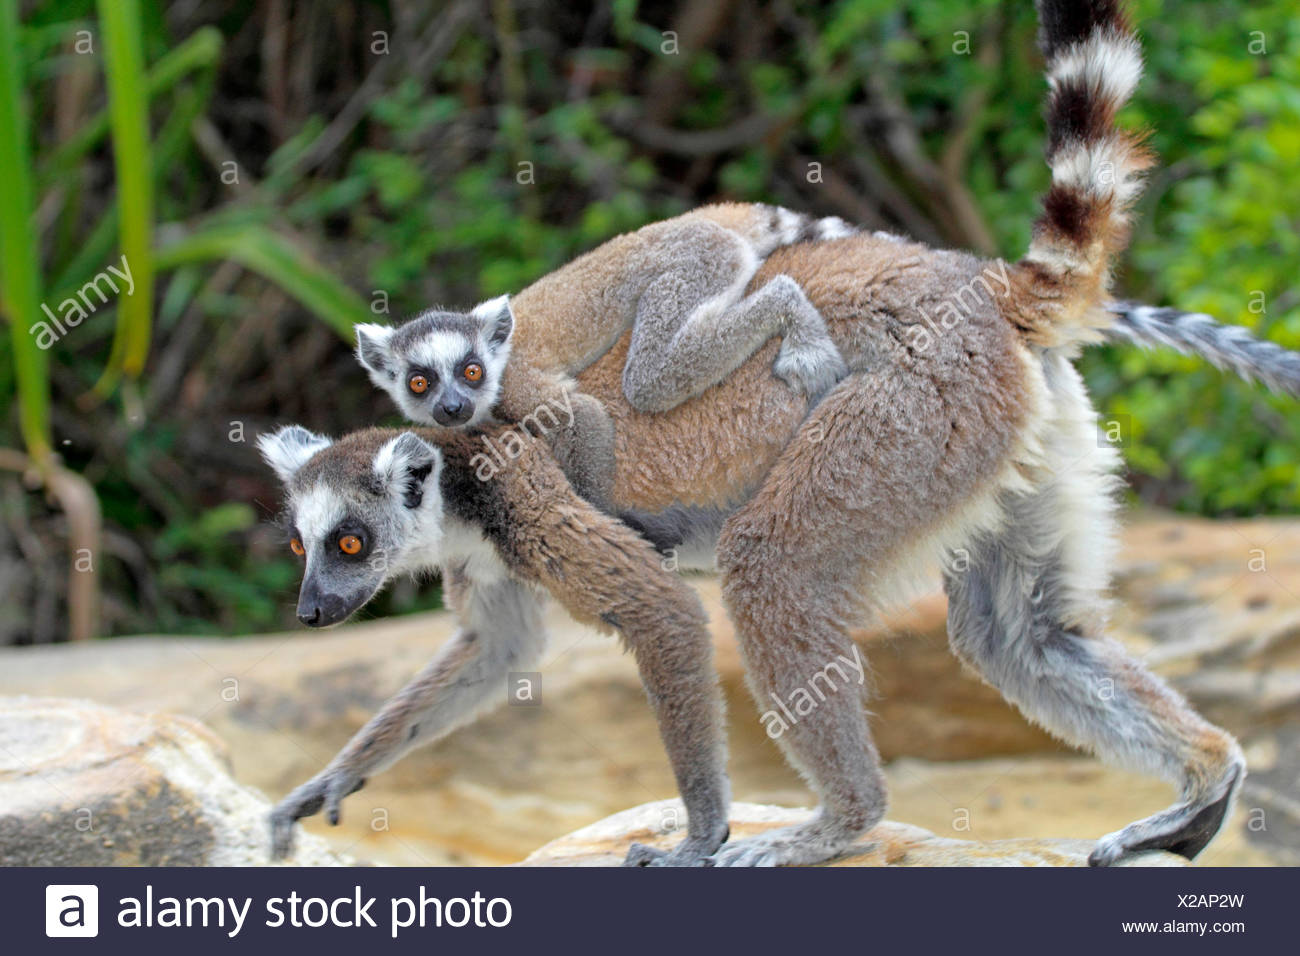 ring-tailed lemur (Lemur catta), female with pup on her back, Madagascar, Andringitra National Park - Stock Image